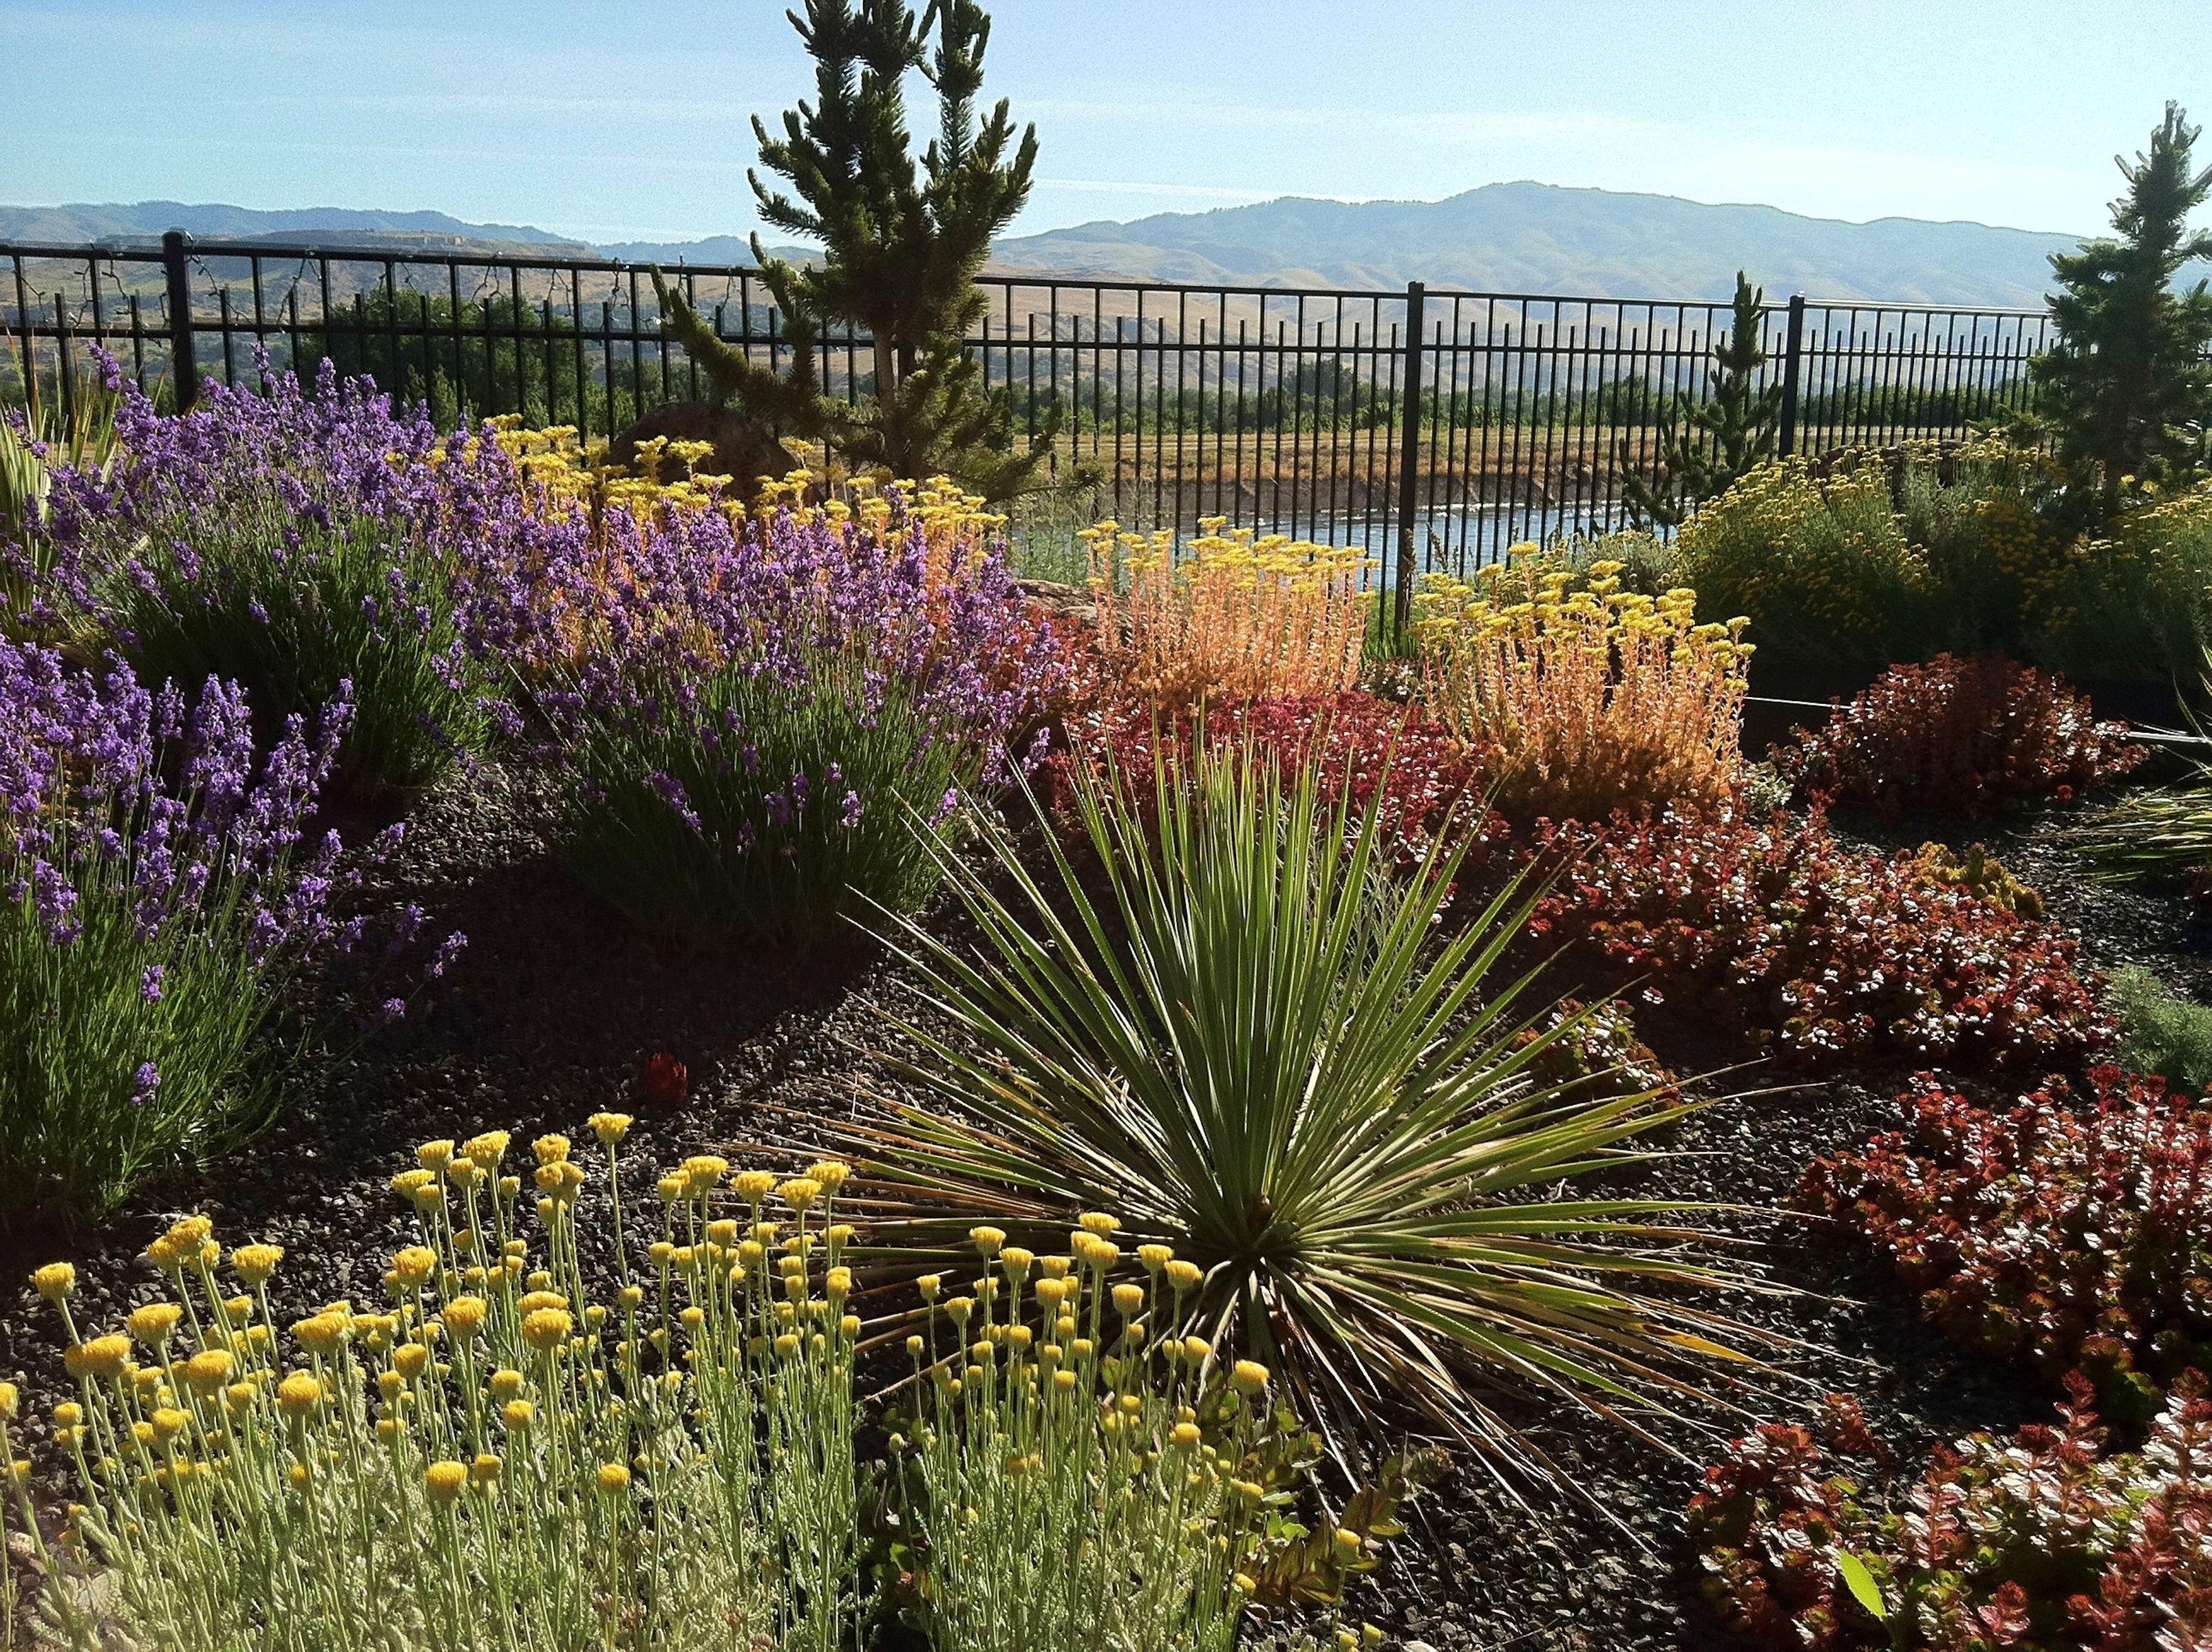 Boise Landscape Design And Build Landscape Design Backyard Landscaping Contemporary Garden